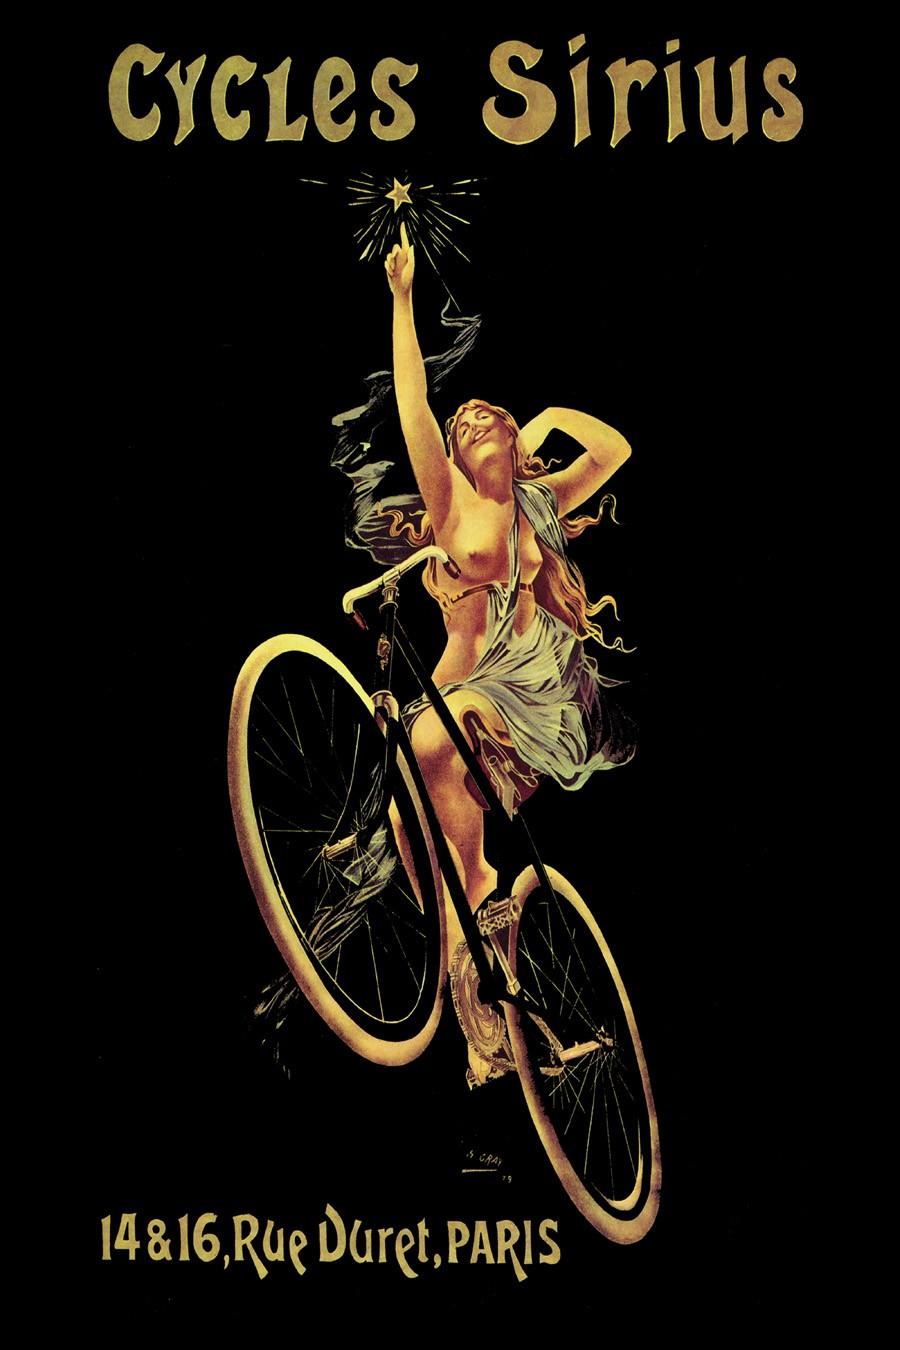 Foto 1 - Cycle Sirius Paris França Bicicleta Mulher NuaVintage Cartaz Poster emPapel Matte